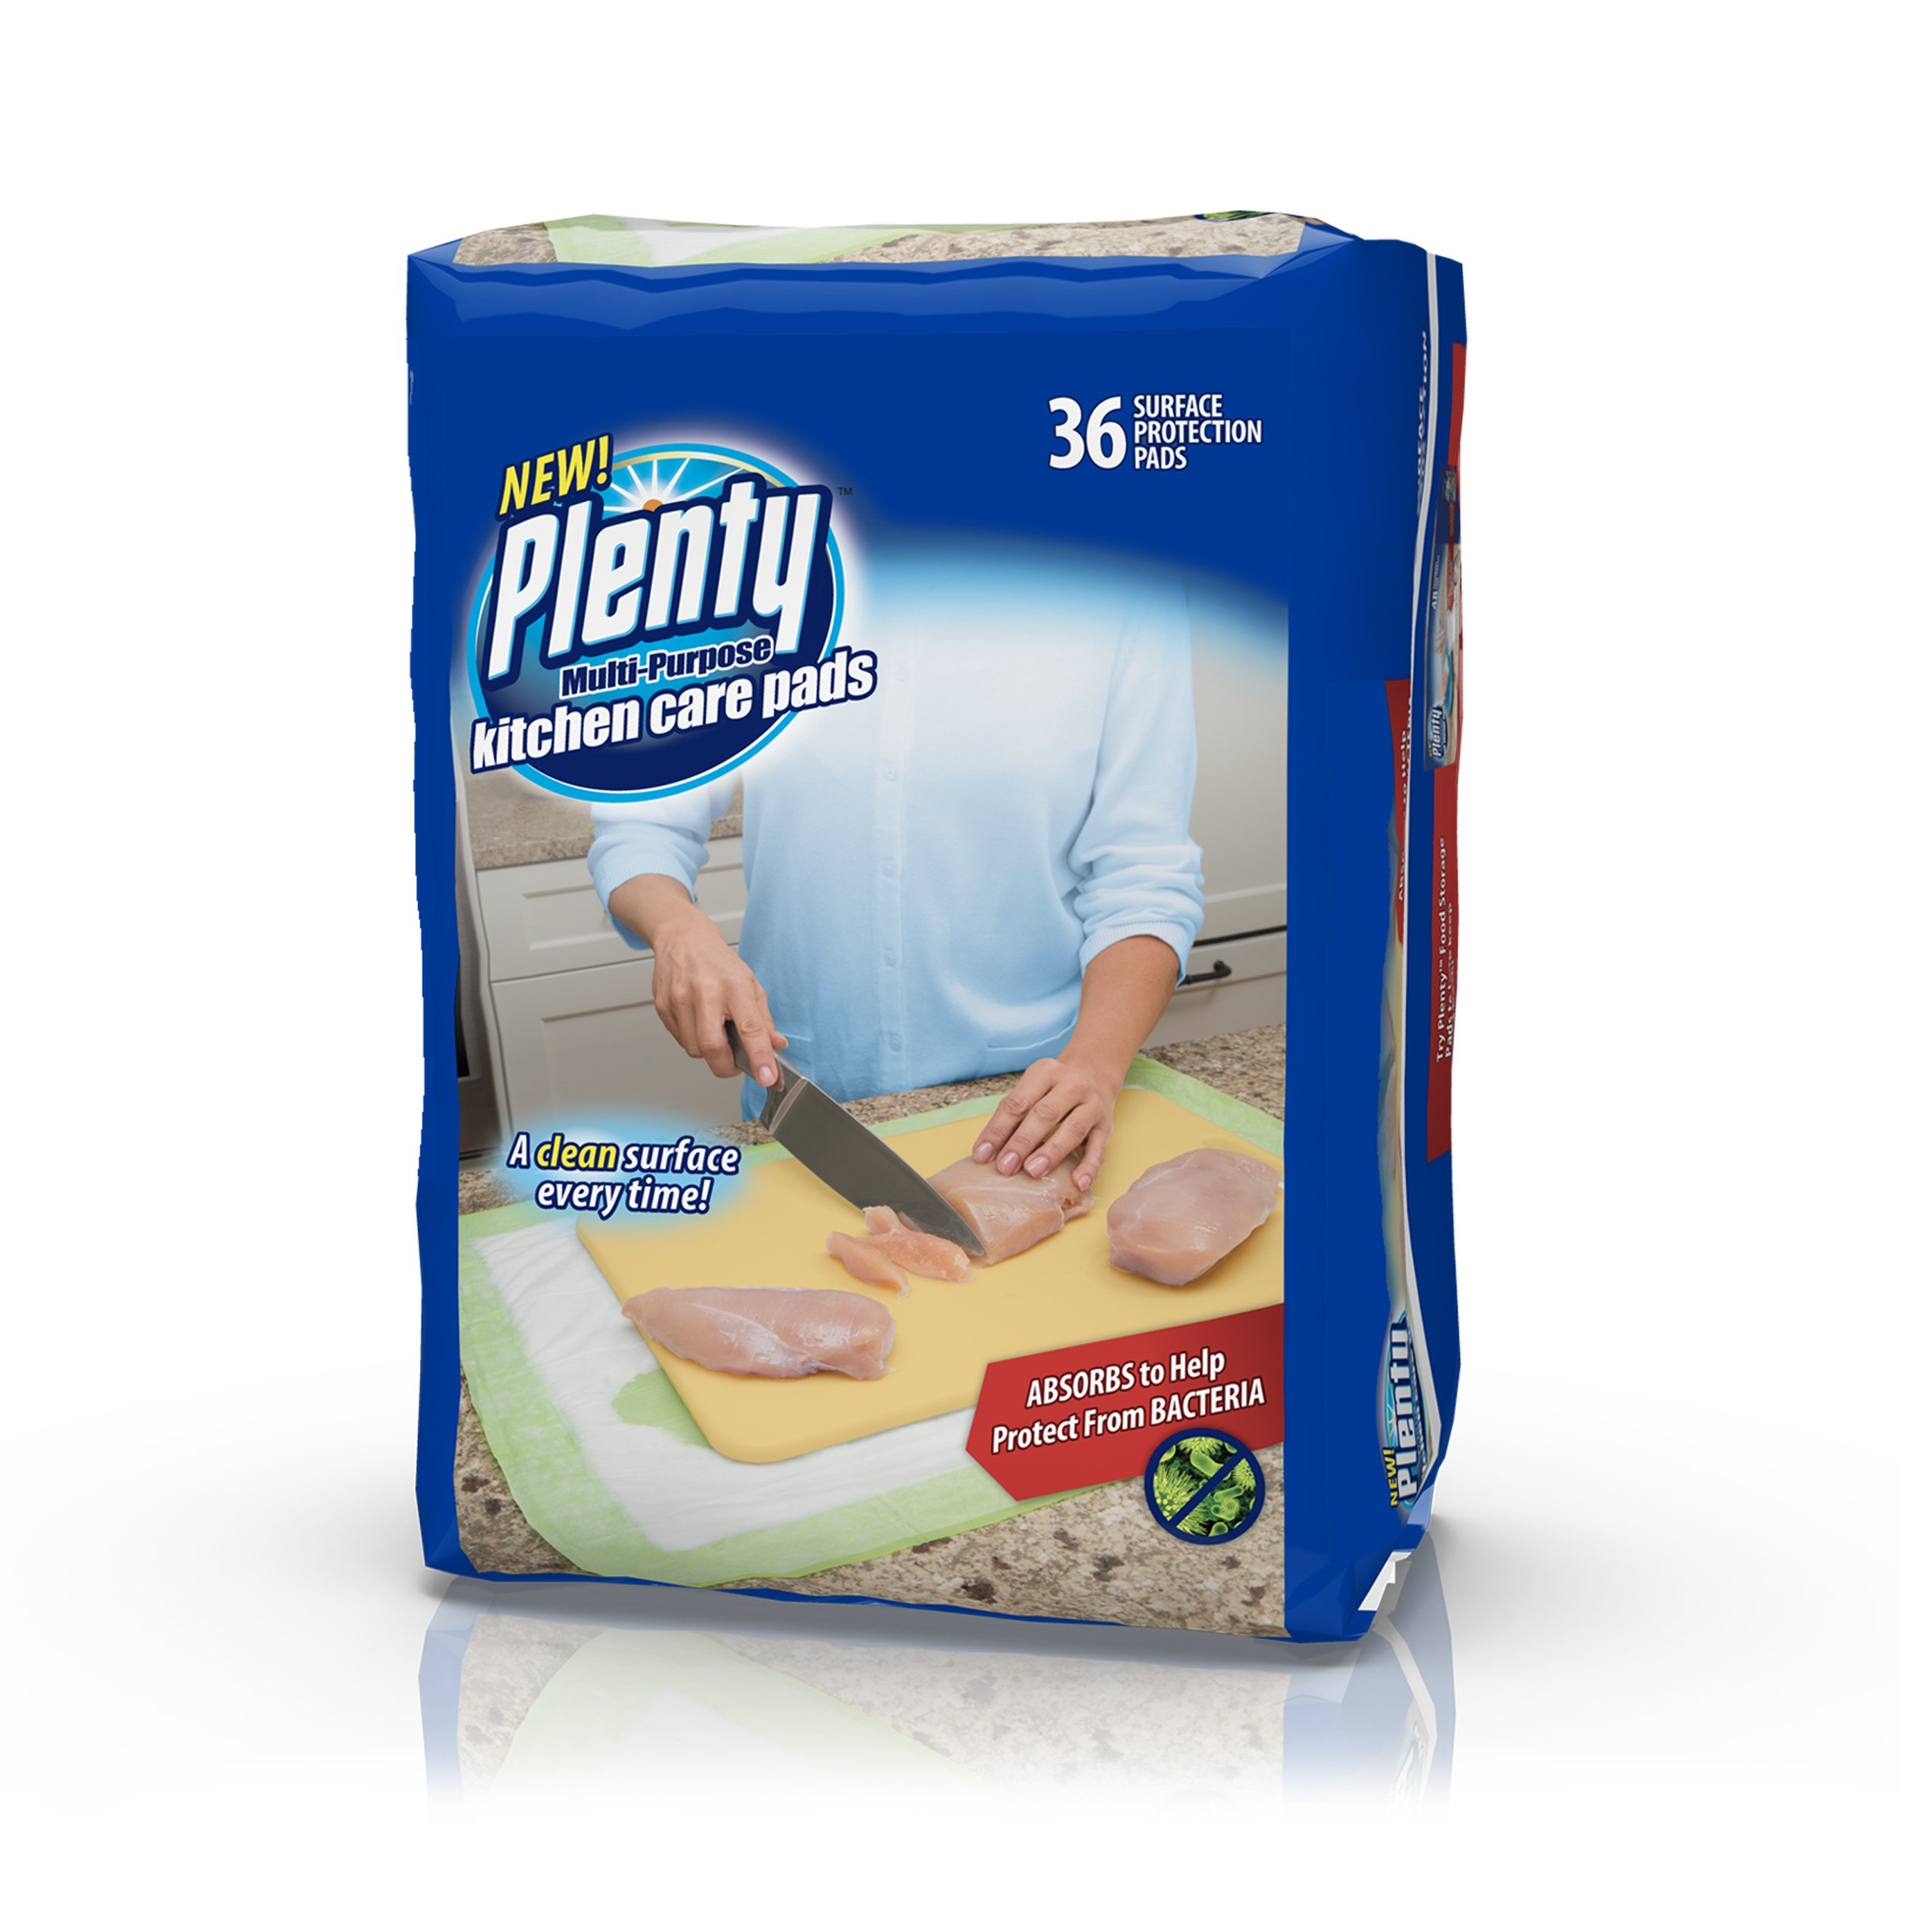 Plenty Multipurpose Kitchen Care Pads, 36 Count